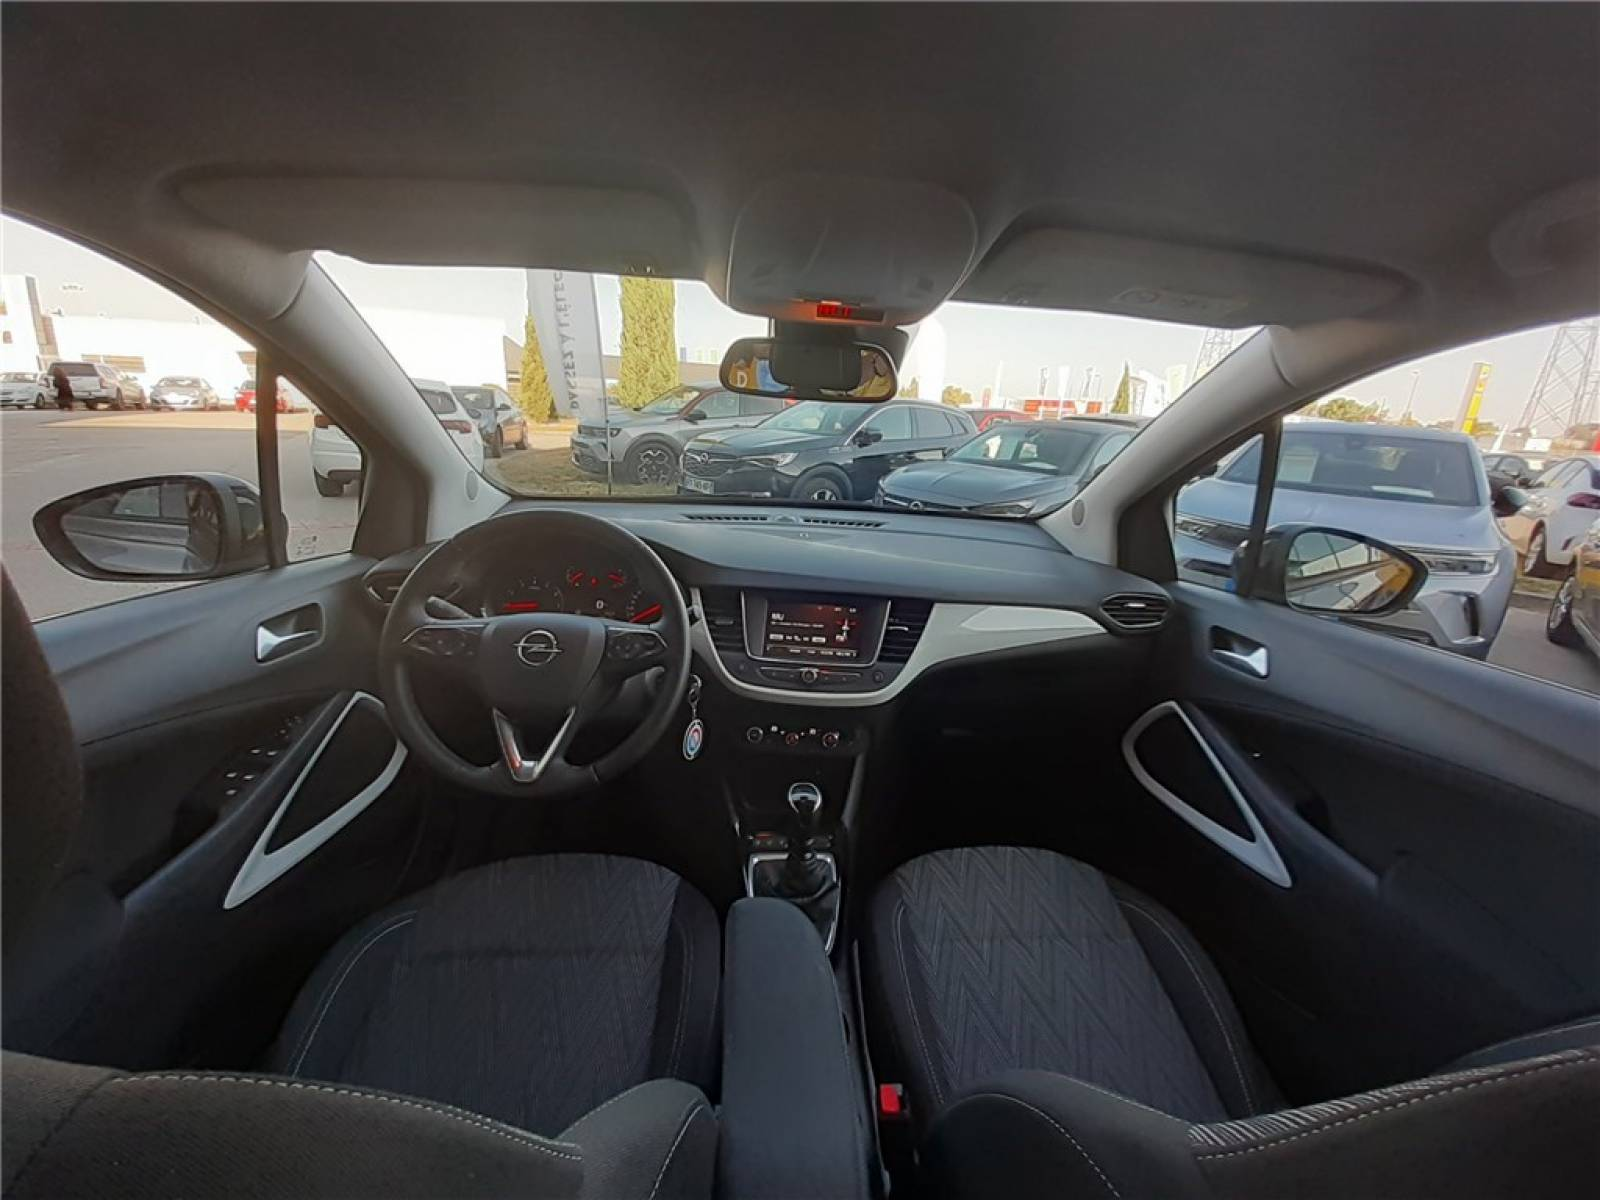 OPEL Crossland X 1.2 Turbo 130 ch - véhicule d'occasion - Groupe Guillet - Opel Magicauto - Chalon-sur-Saône - 71380 - Saint-Marcel - 38